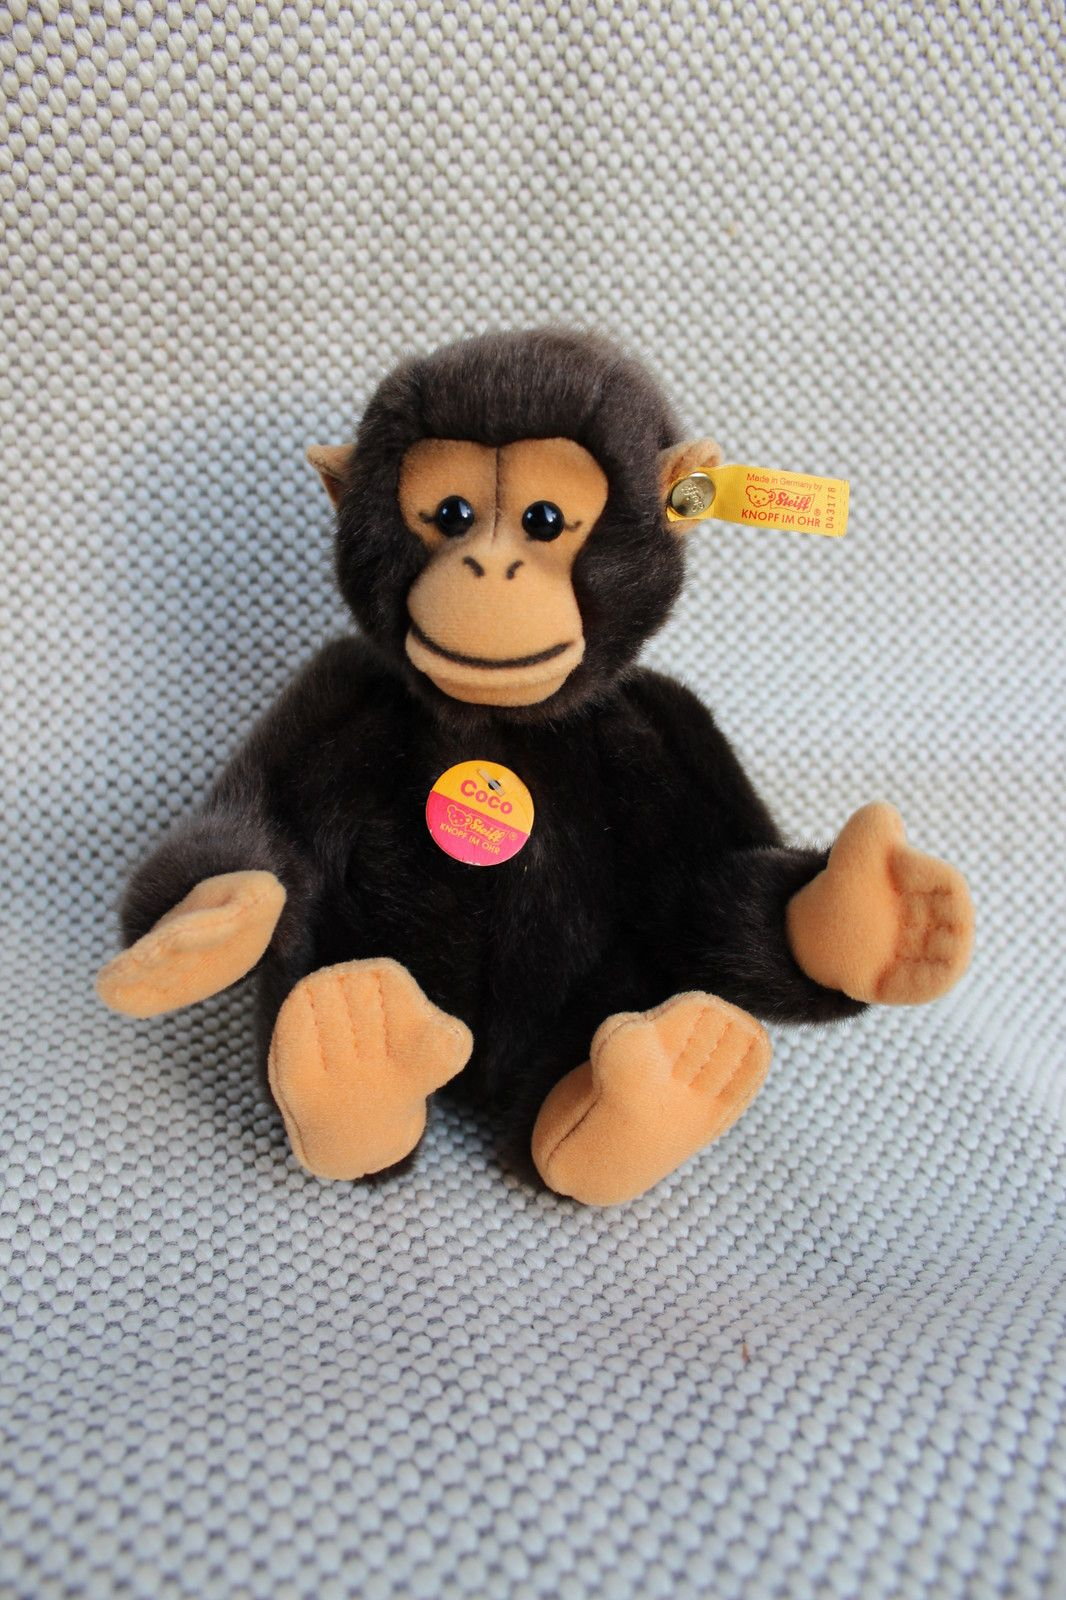 Steiff Coco Chimpanzee 5 Button In Ear And Chest Tag Ean 043178